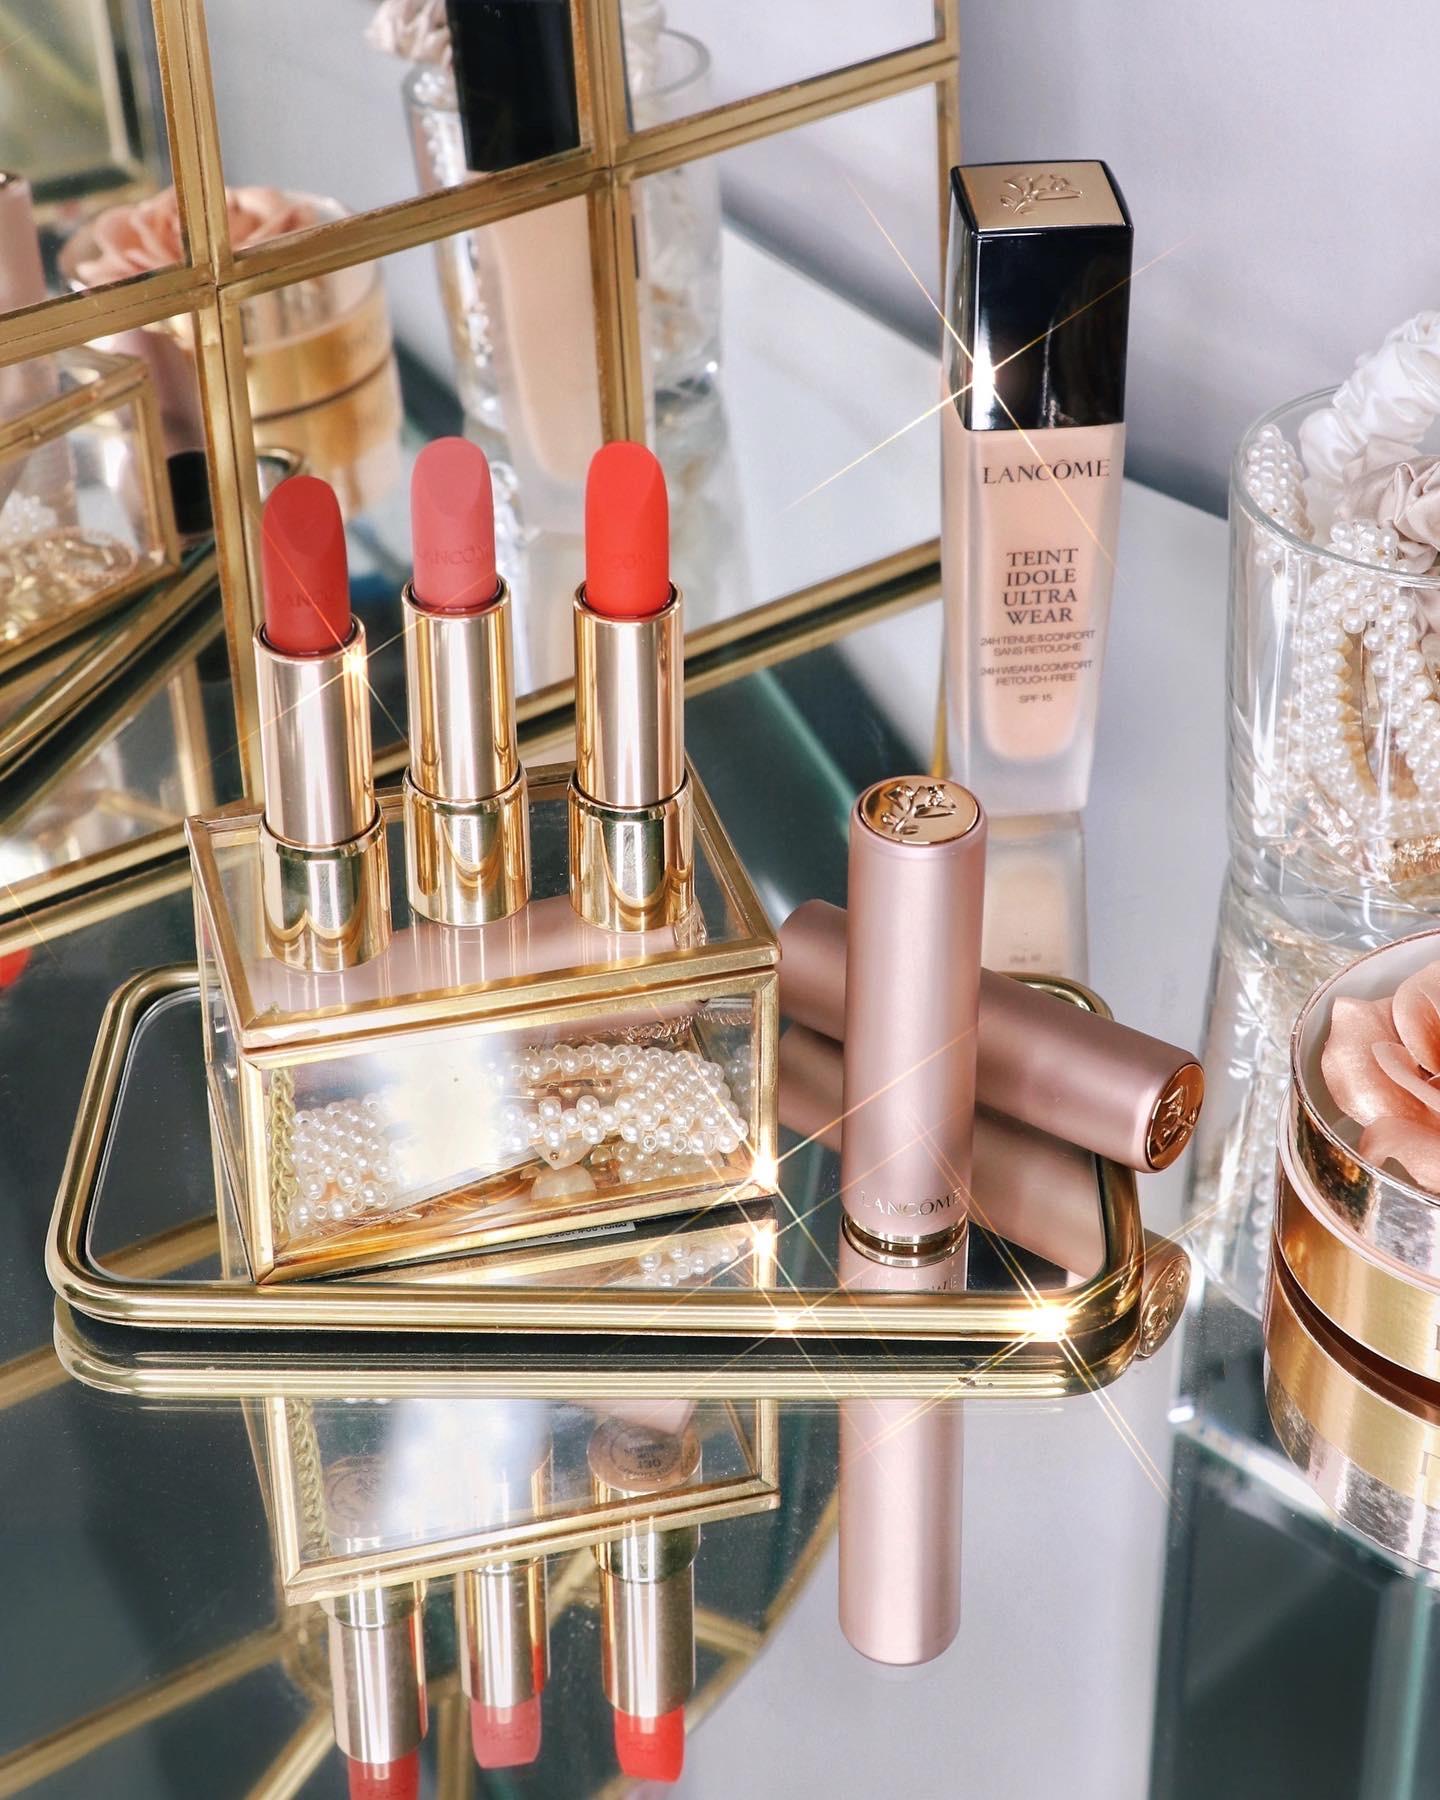 Lancôme L'Absolu Rouge Intimatte Lipsticks